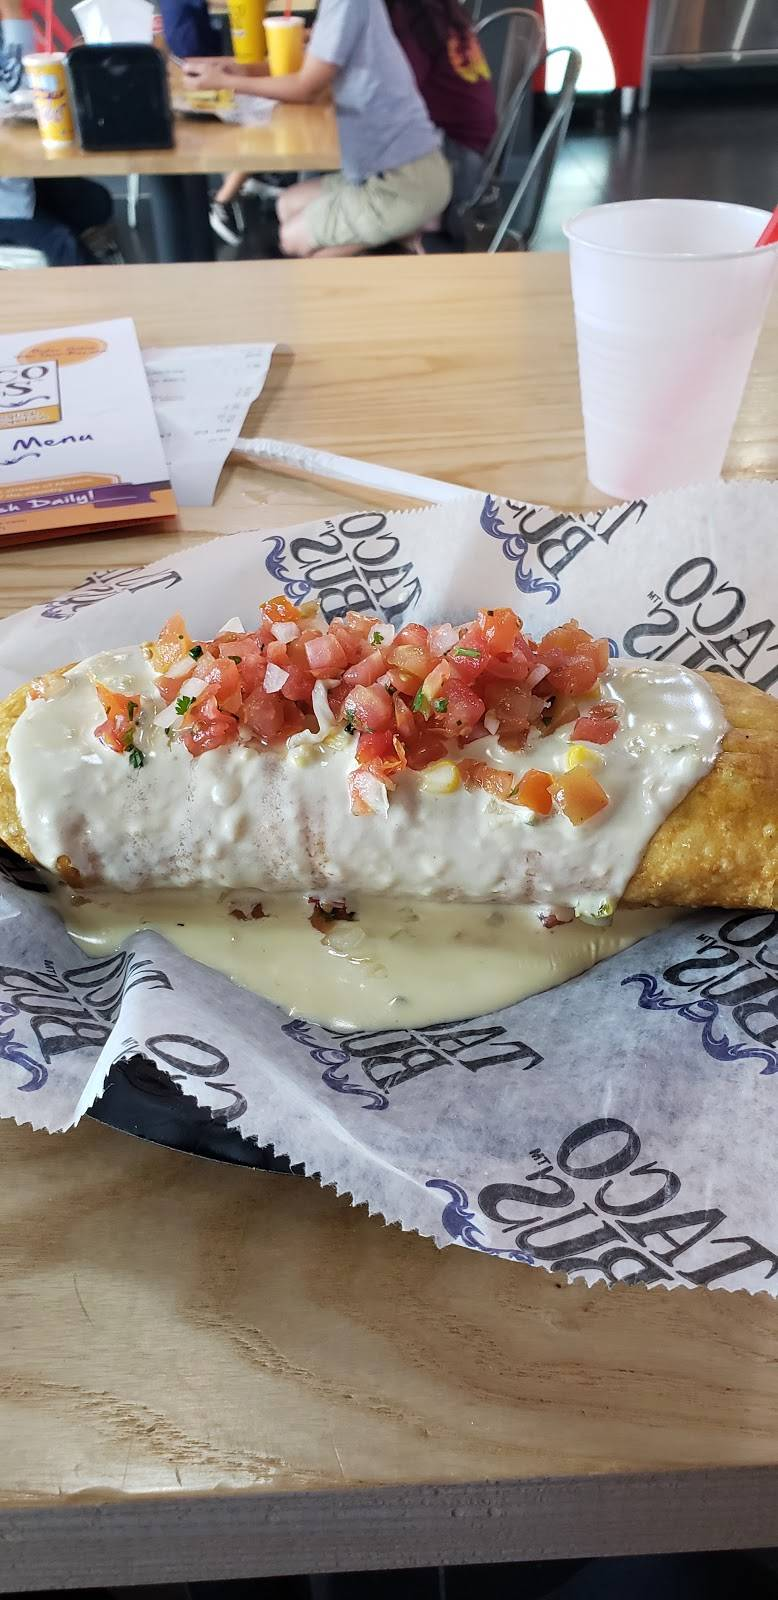 Taco Bus - restaurant    Photo 9 of 10   Address: 7218 E Hillsborough Ave, Tampa, FL 33610, USA   Phone: (813) 302-9992